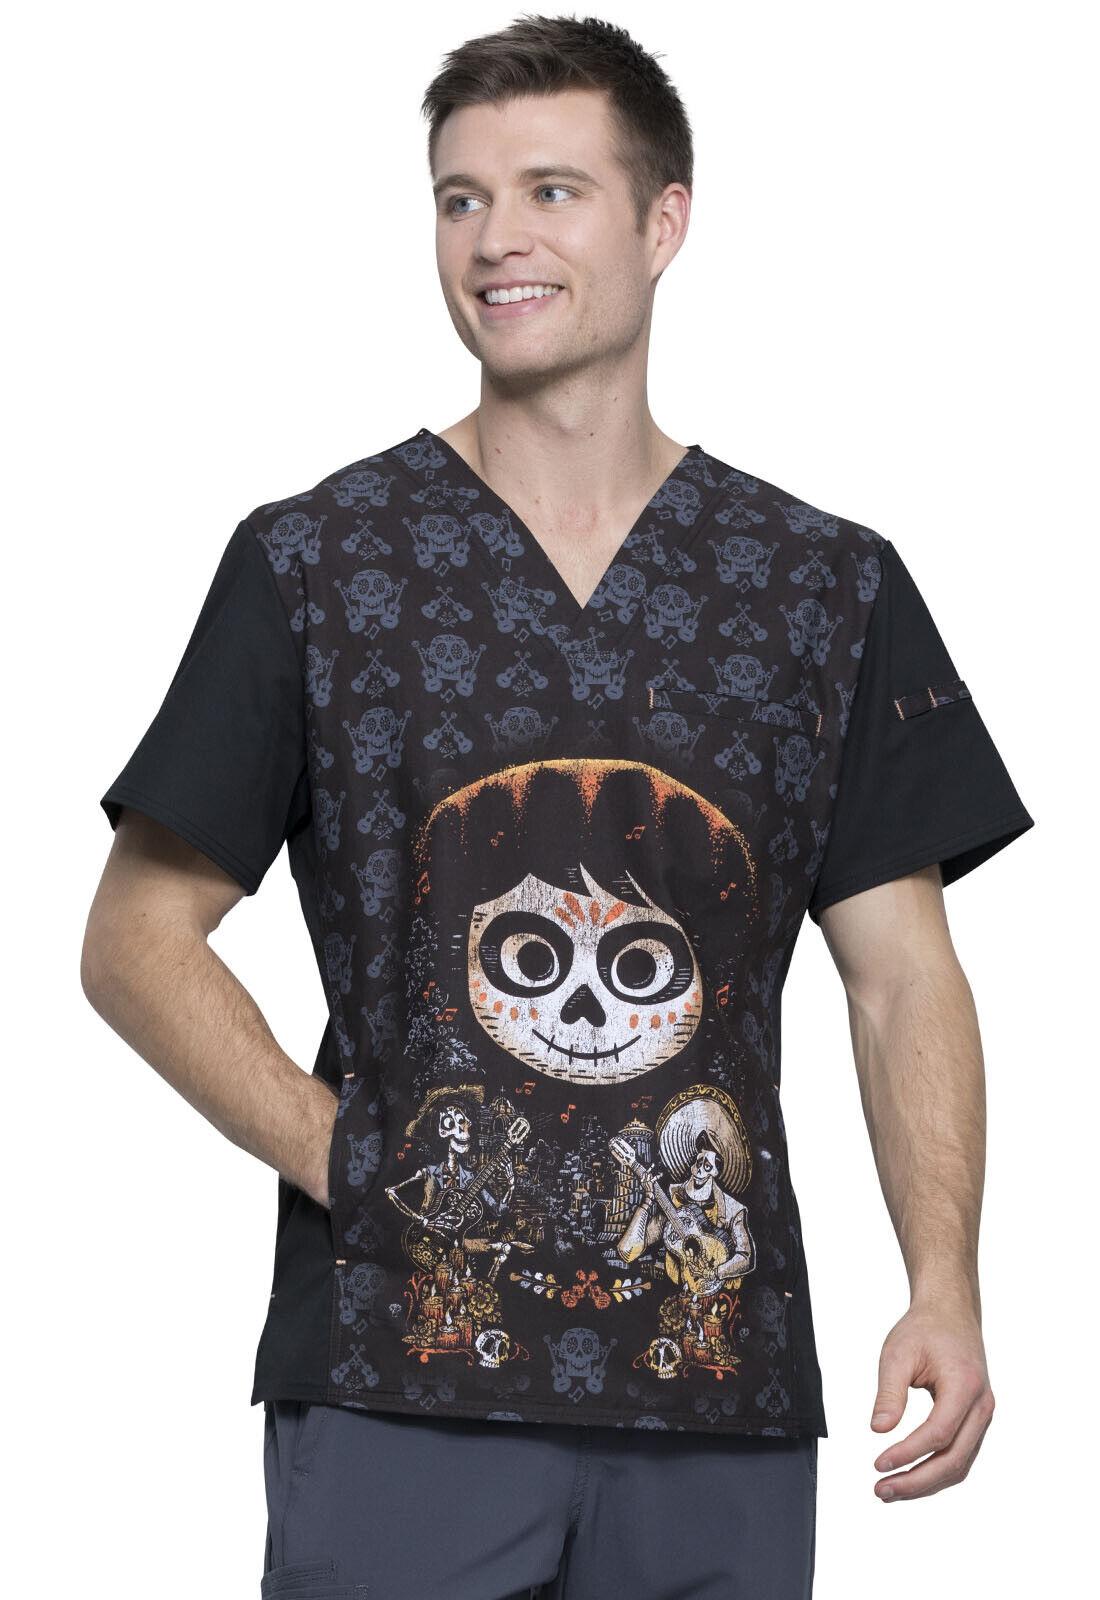 Coco Cherokee Scrubs Tooniforms Disney Mens V Neck Top TF700